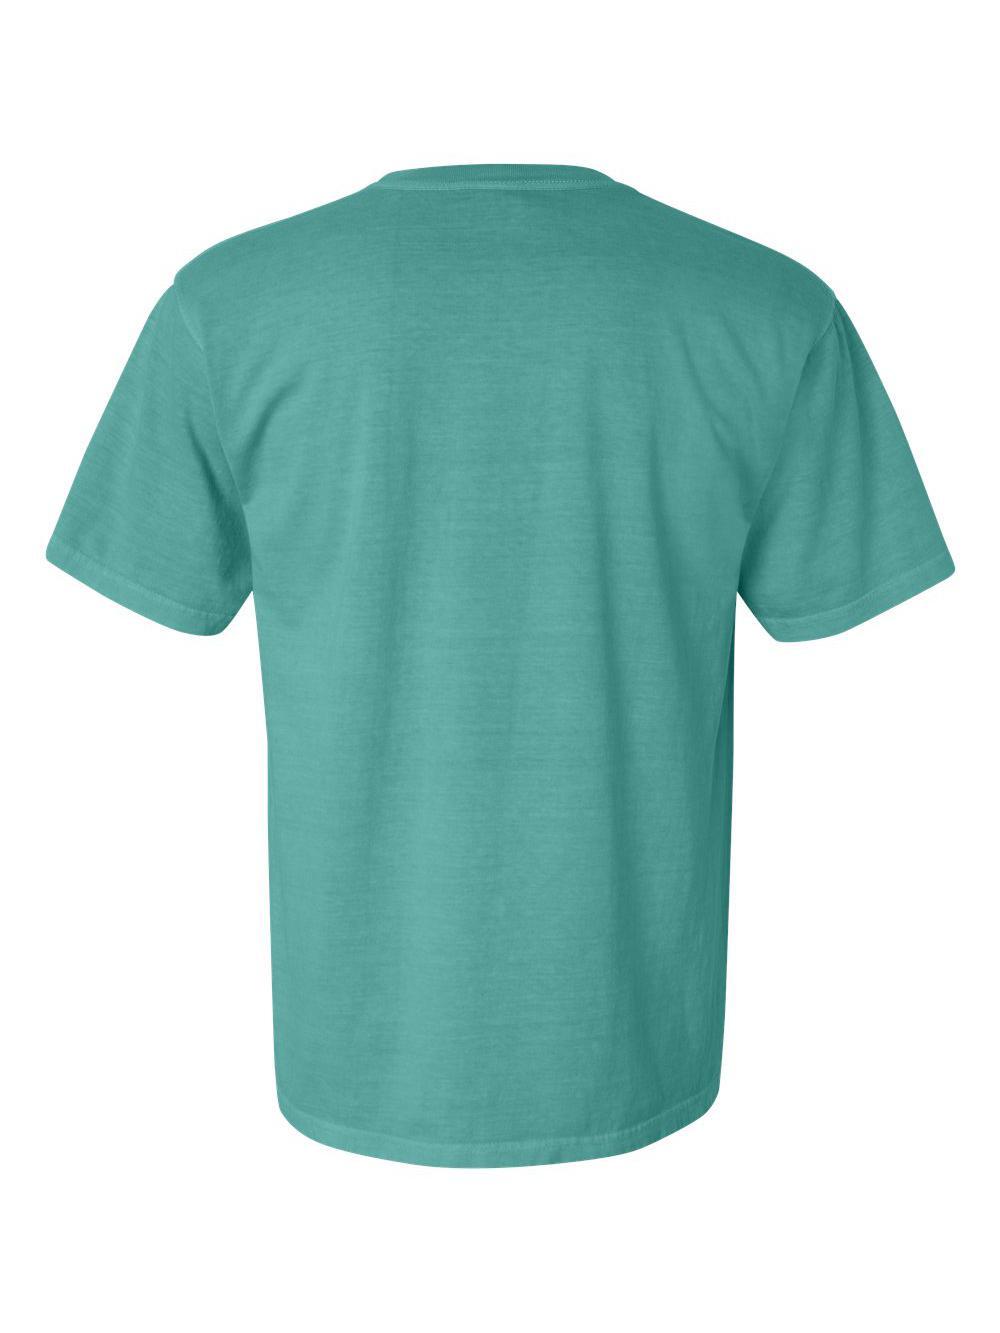 Comfort-Colors-Garment-Dyed-Heavyweight-Ringspun-Short-Sleeve-Shirt-1717 thumbnail 118